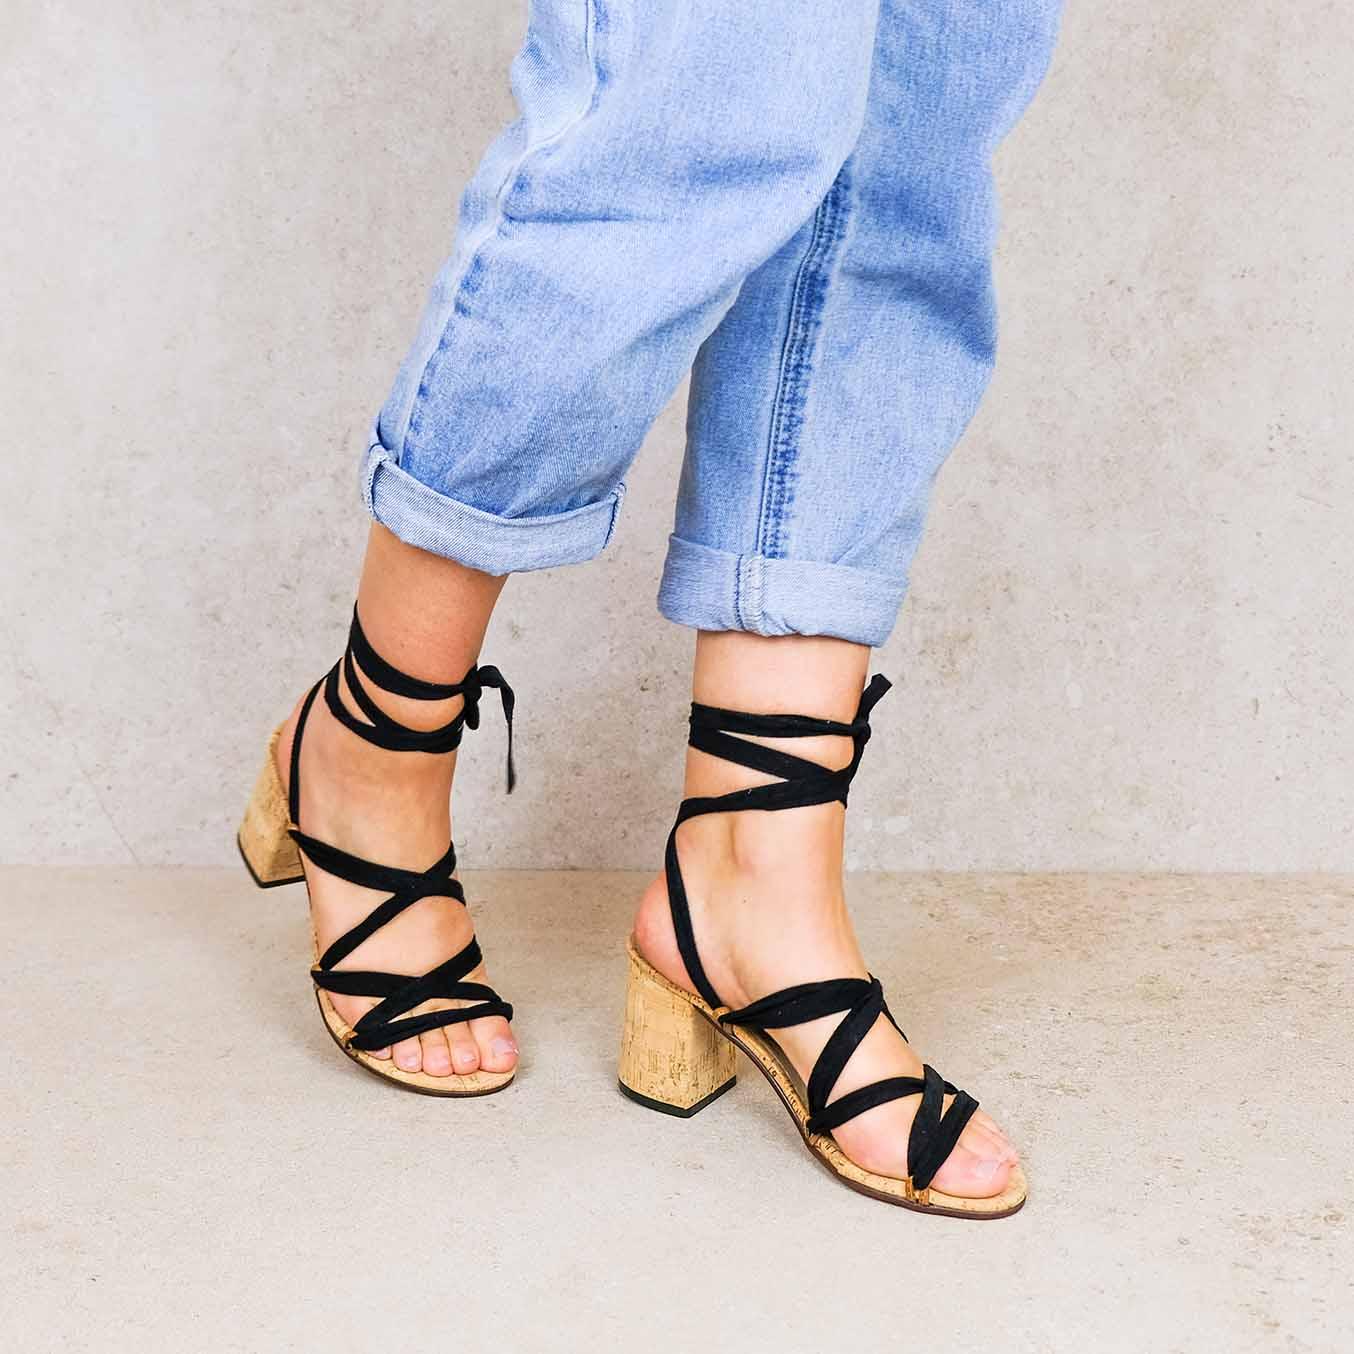 Camila2-lintsandalen sandals travelsandals vegan sustainable sandals wikkelsandalen